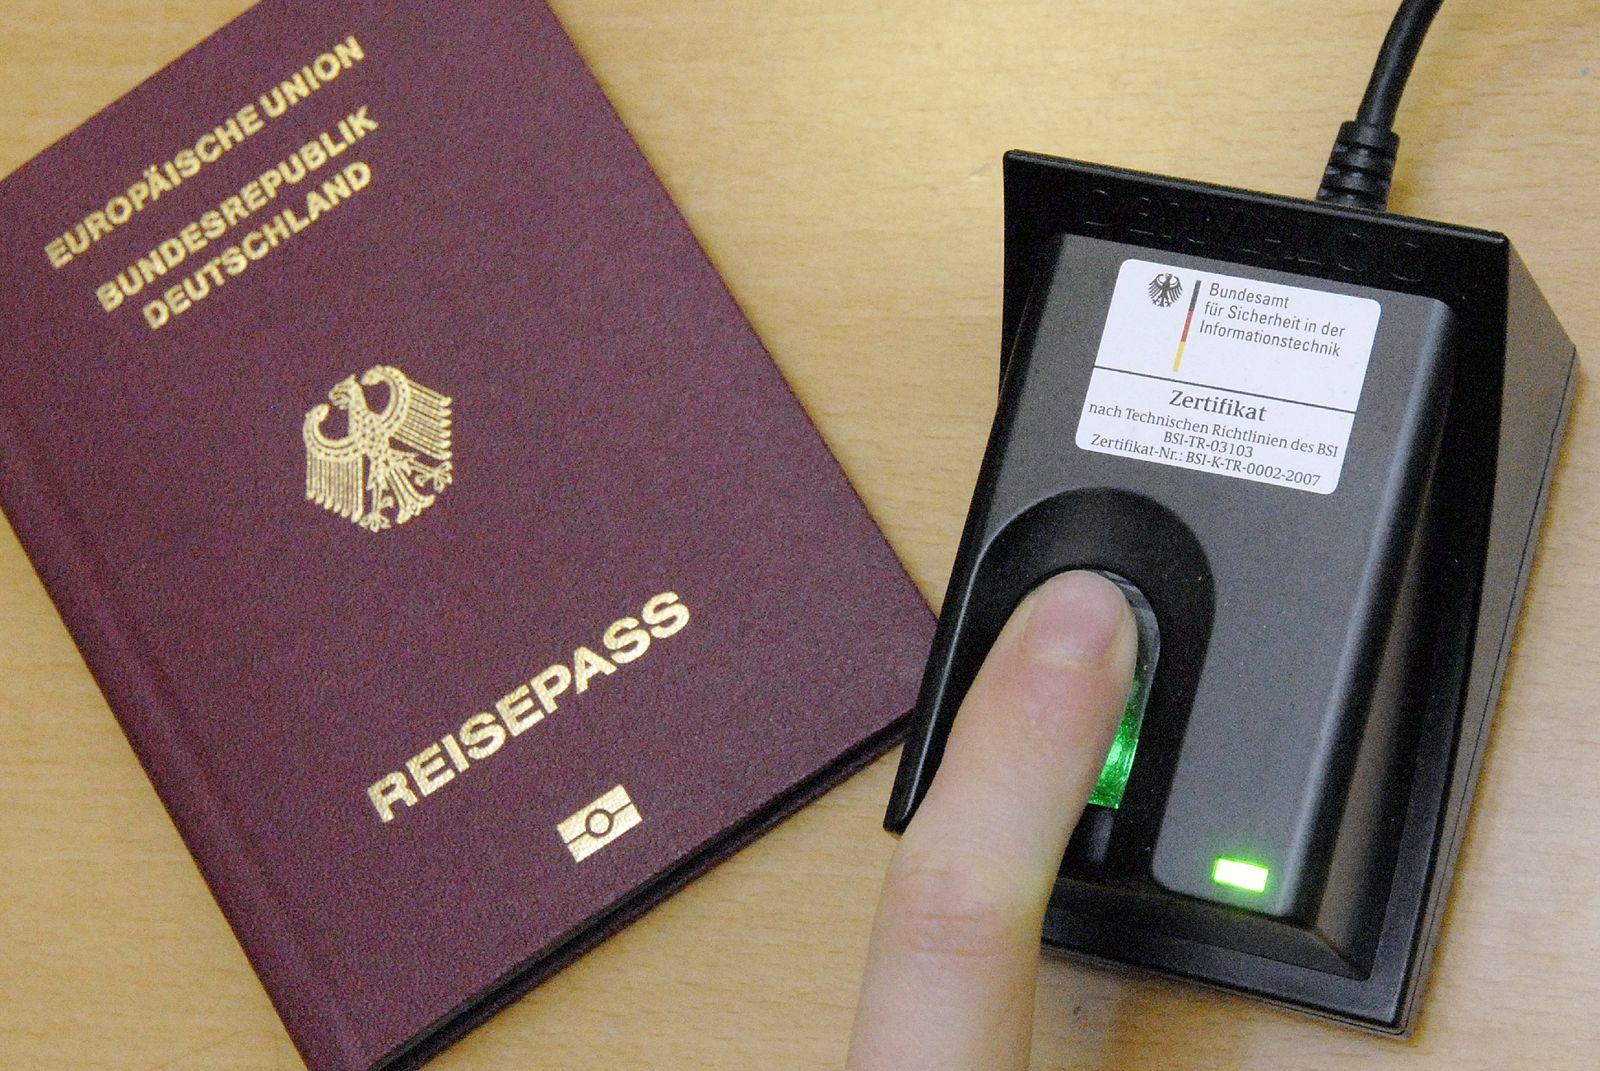 Reisepass Fingerabdruck Wo Gespeichert